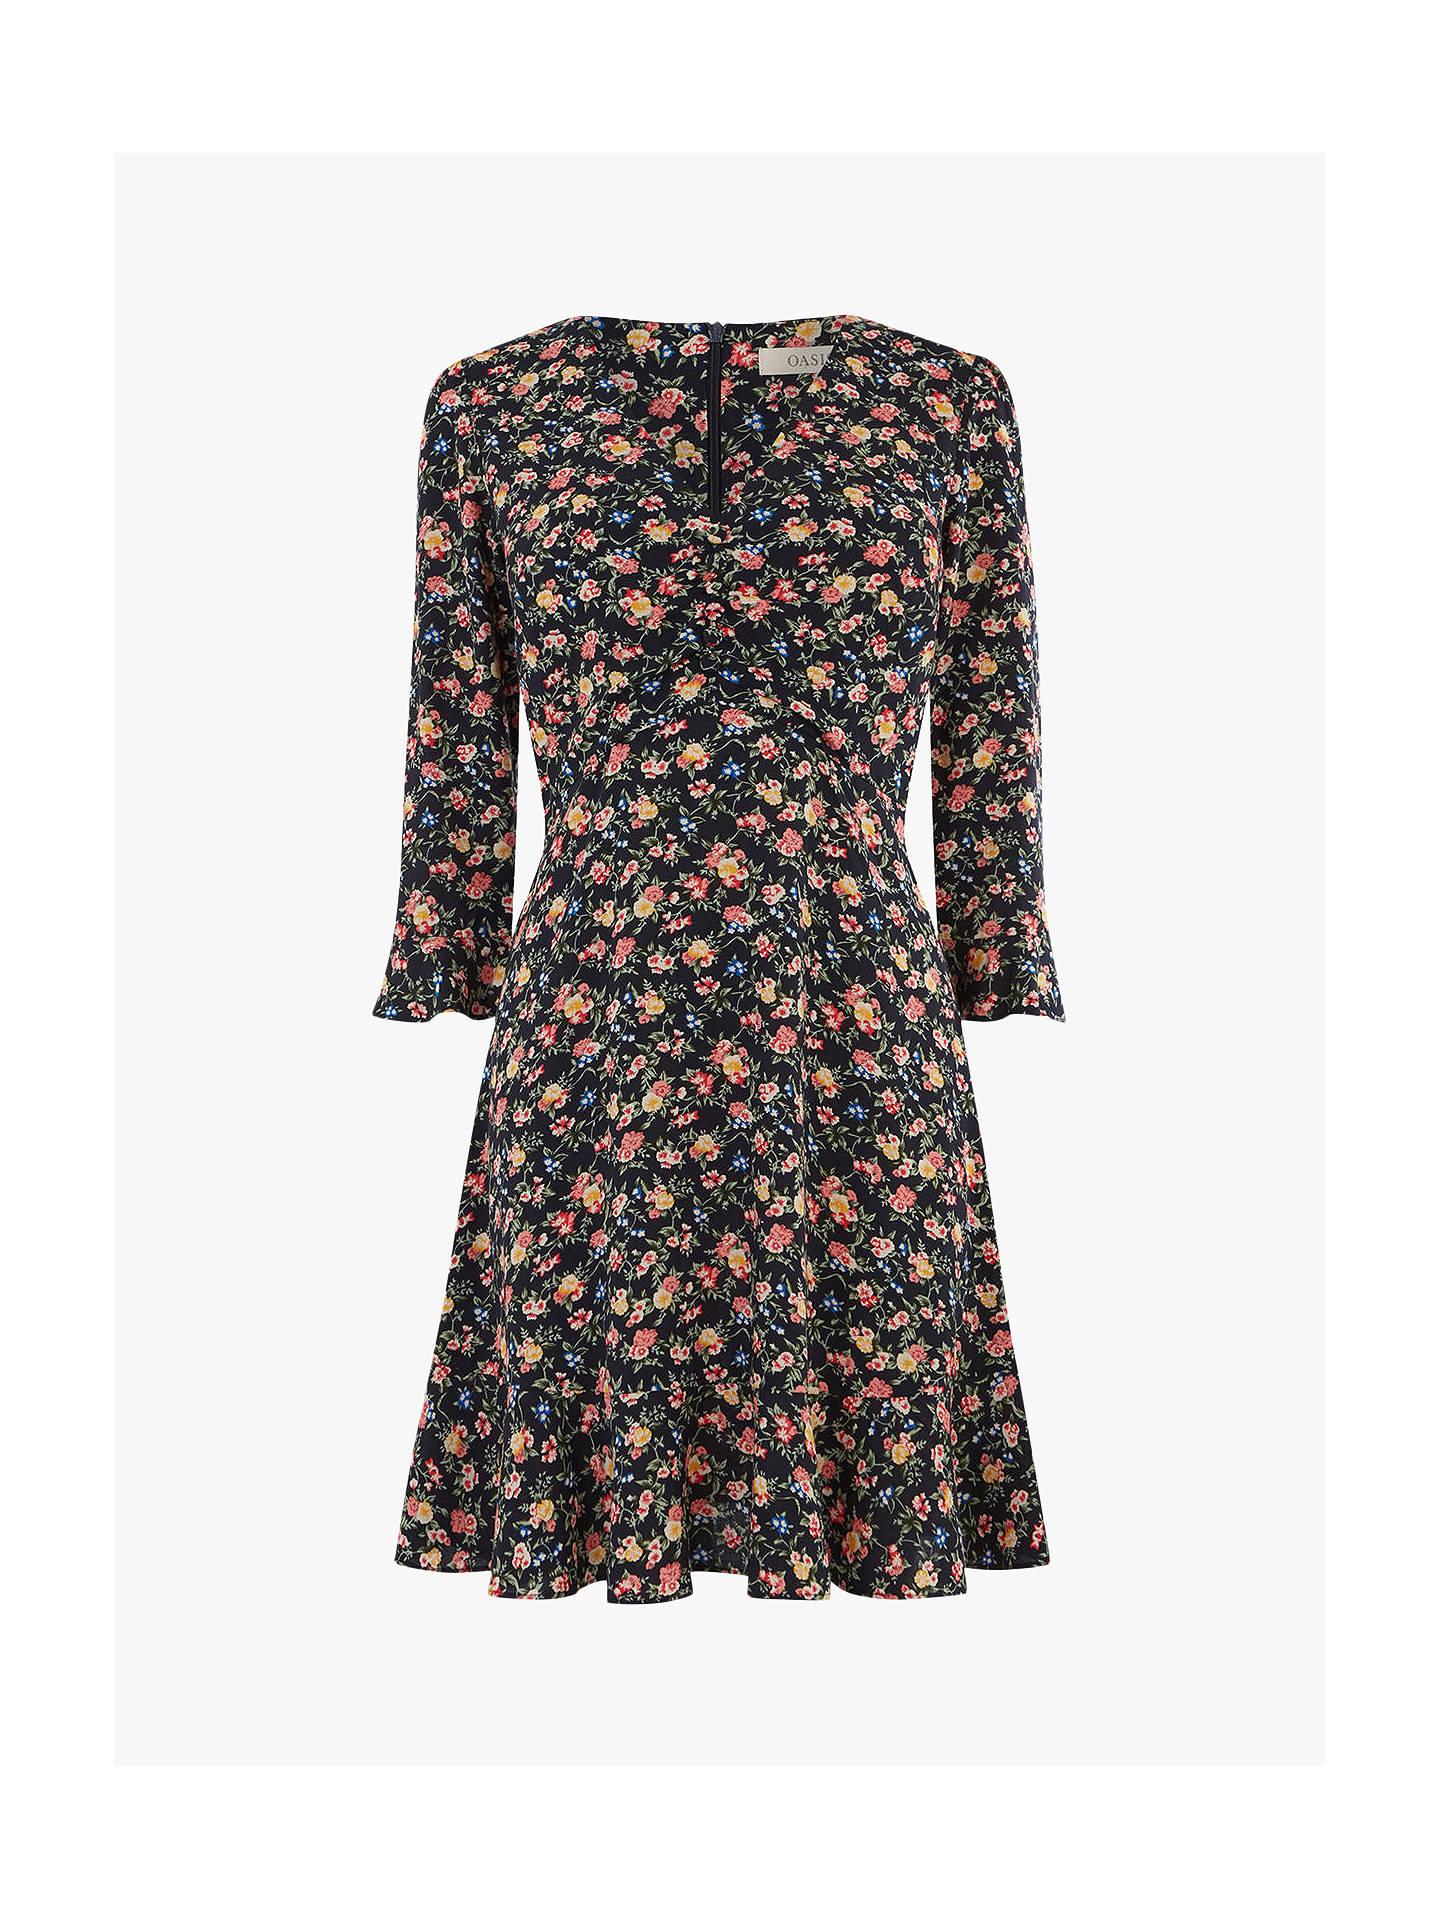 ad09abdc5e92 ... Buy Oasis Garden Ditsy Skater Dress, Multi, 6R Online at johnlewis.com  ...